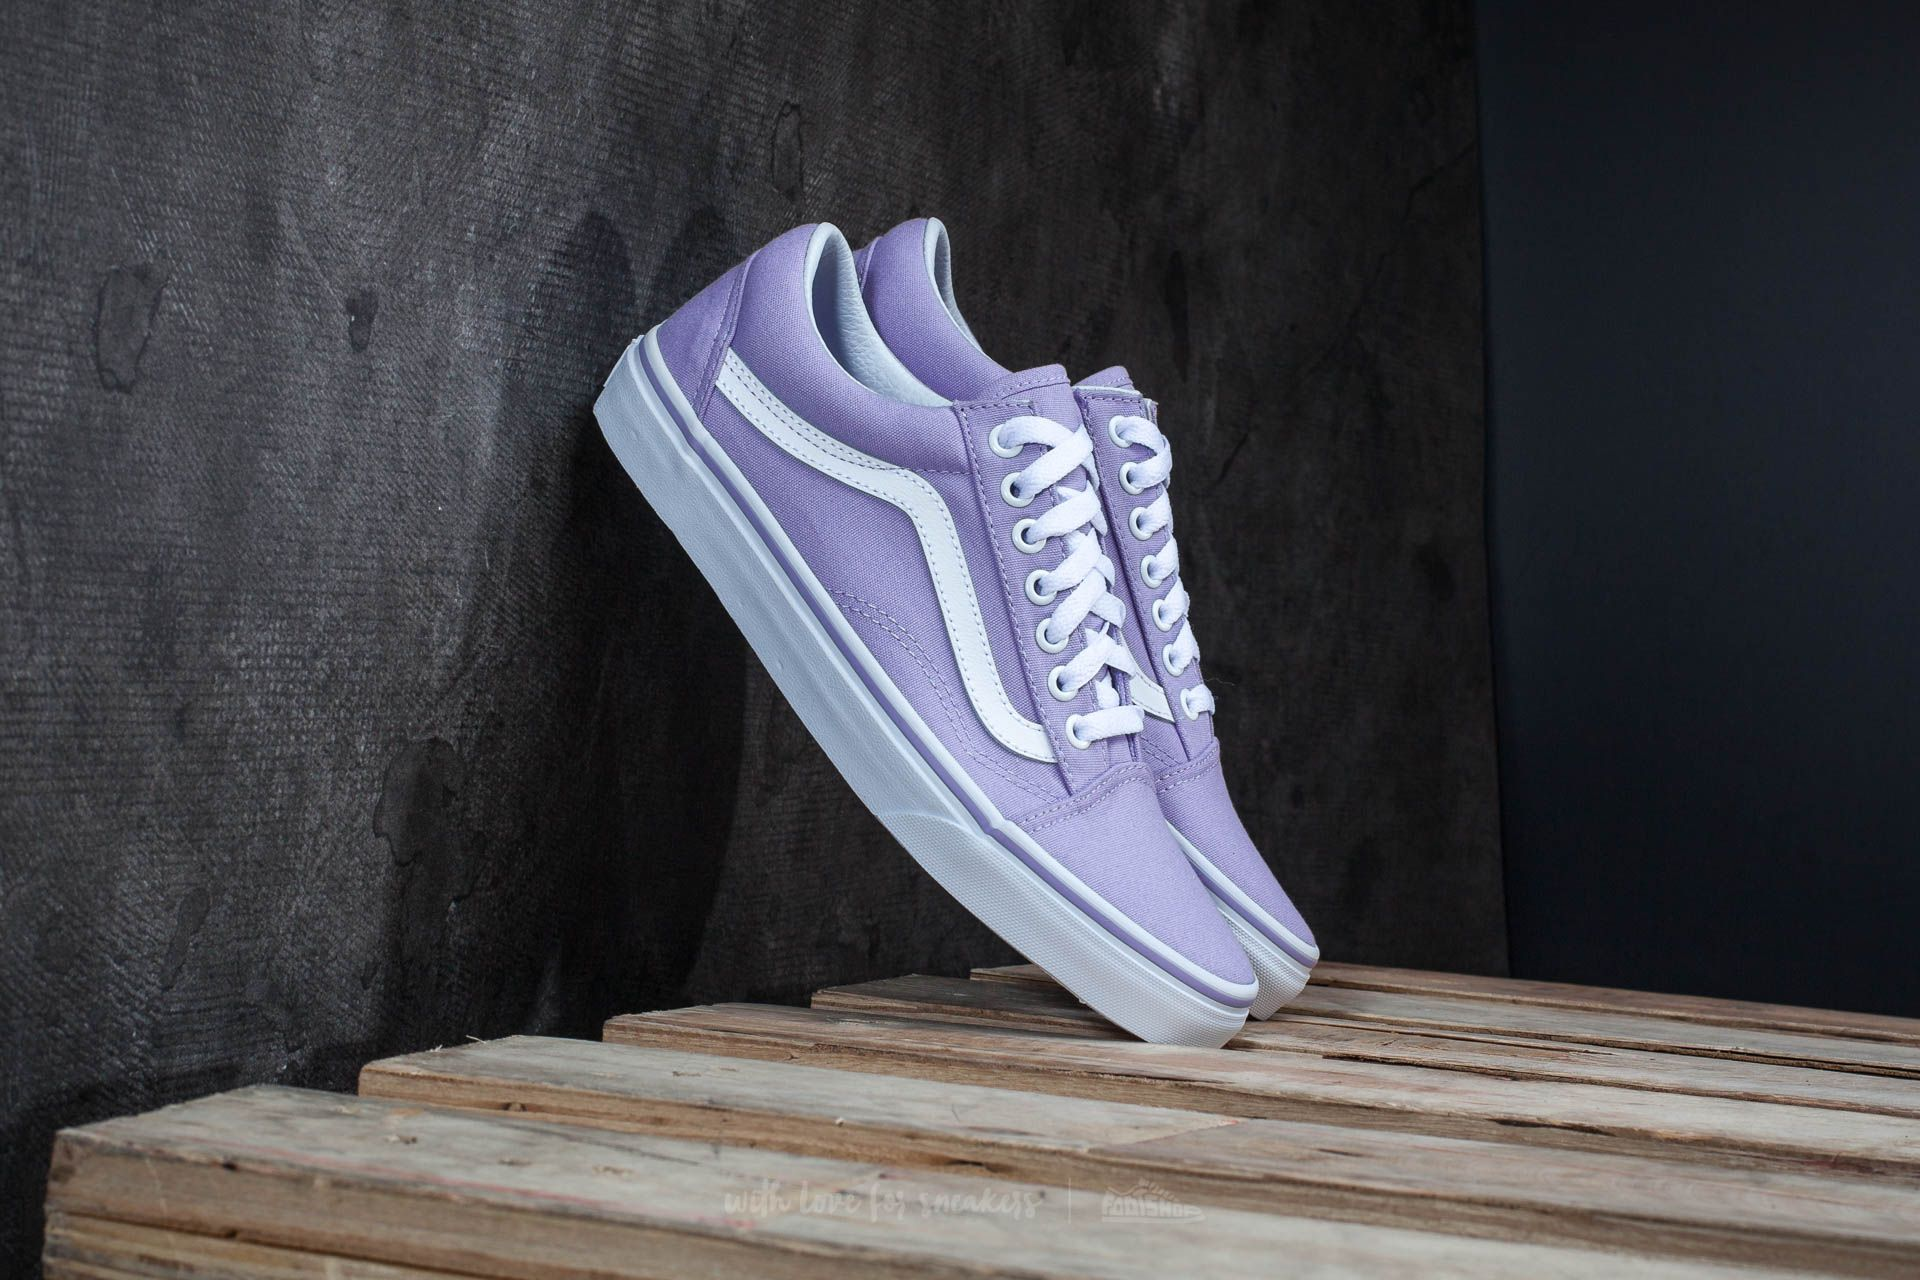 Vans Old Skool Lavender Lavender/ True White